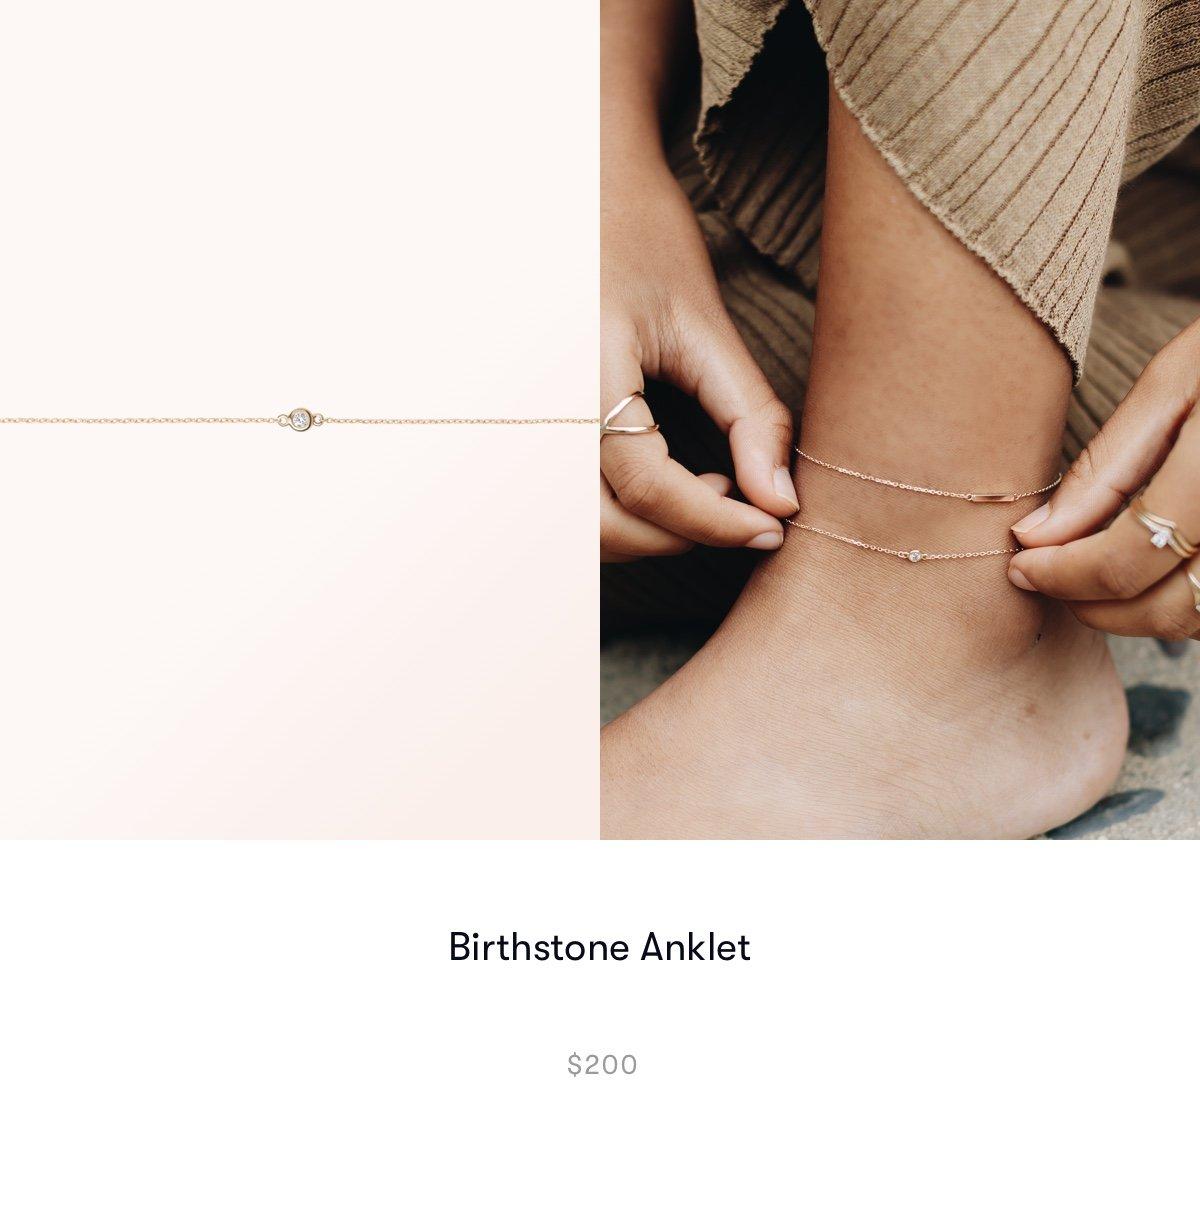 Birthstone anklet